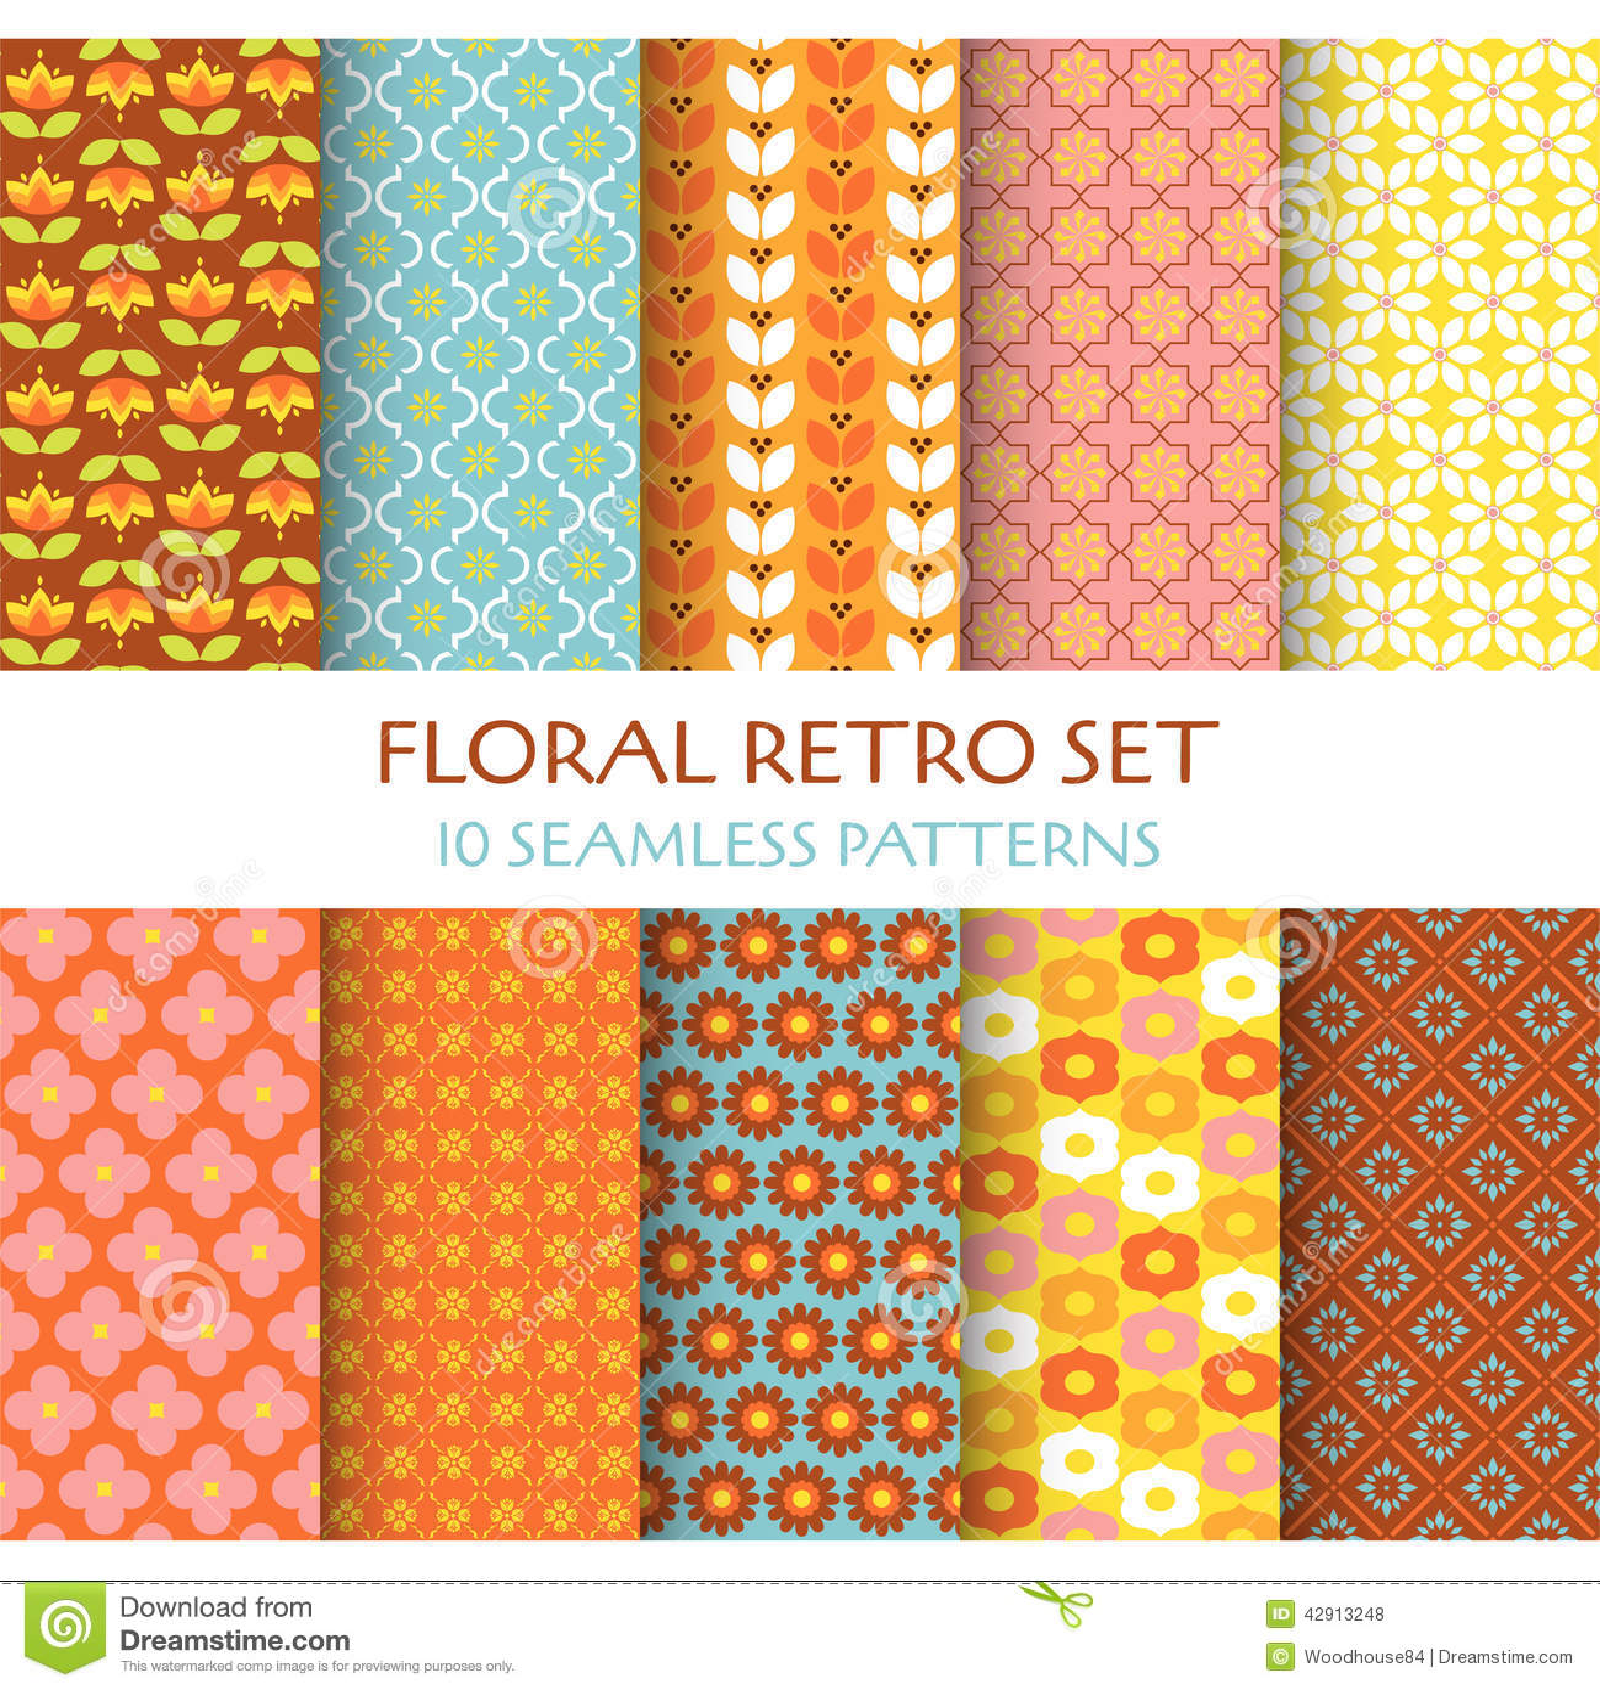 10 Seamless Patterns - Floral Retro